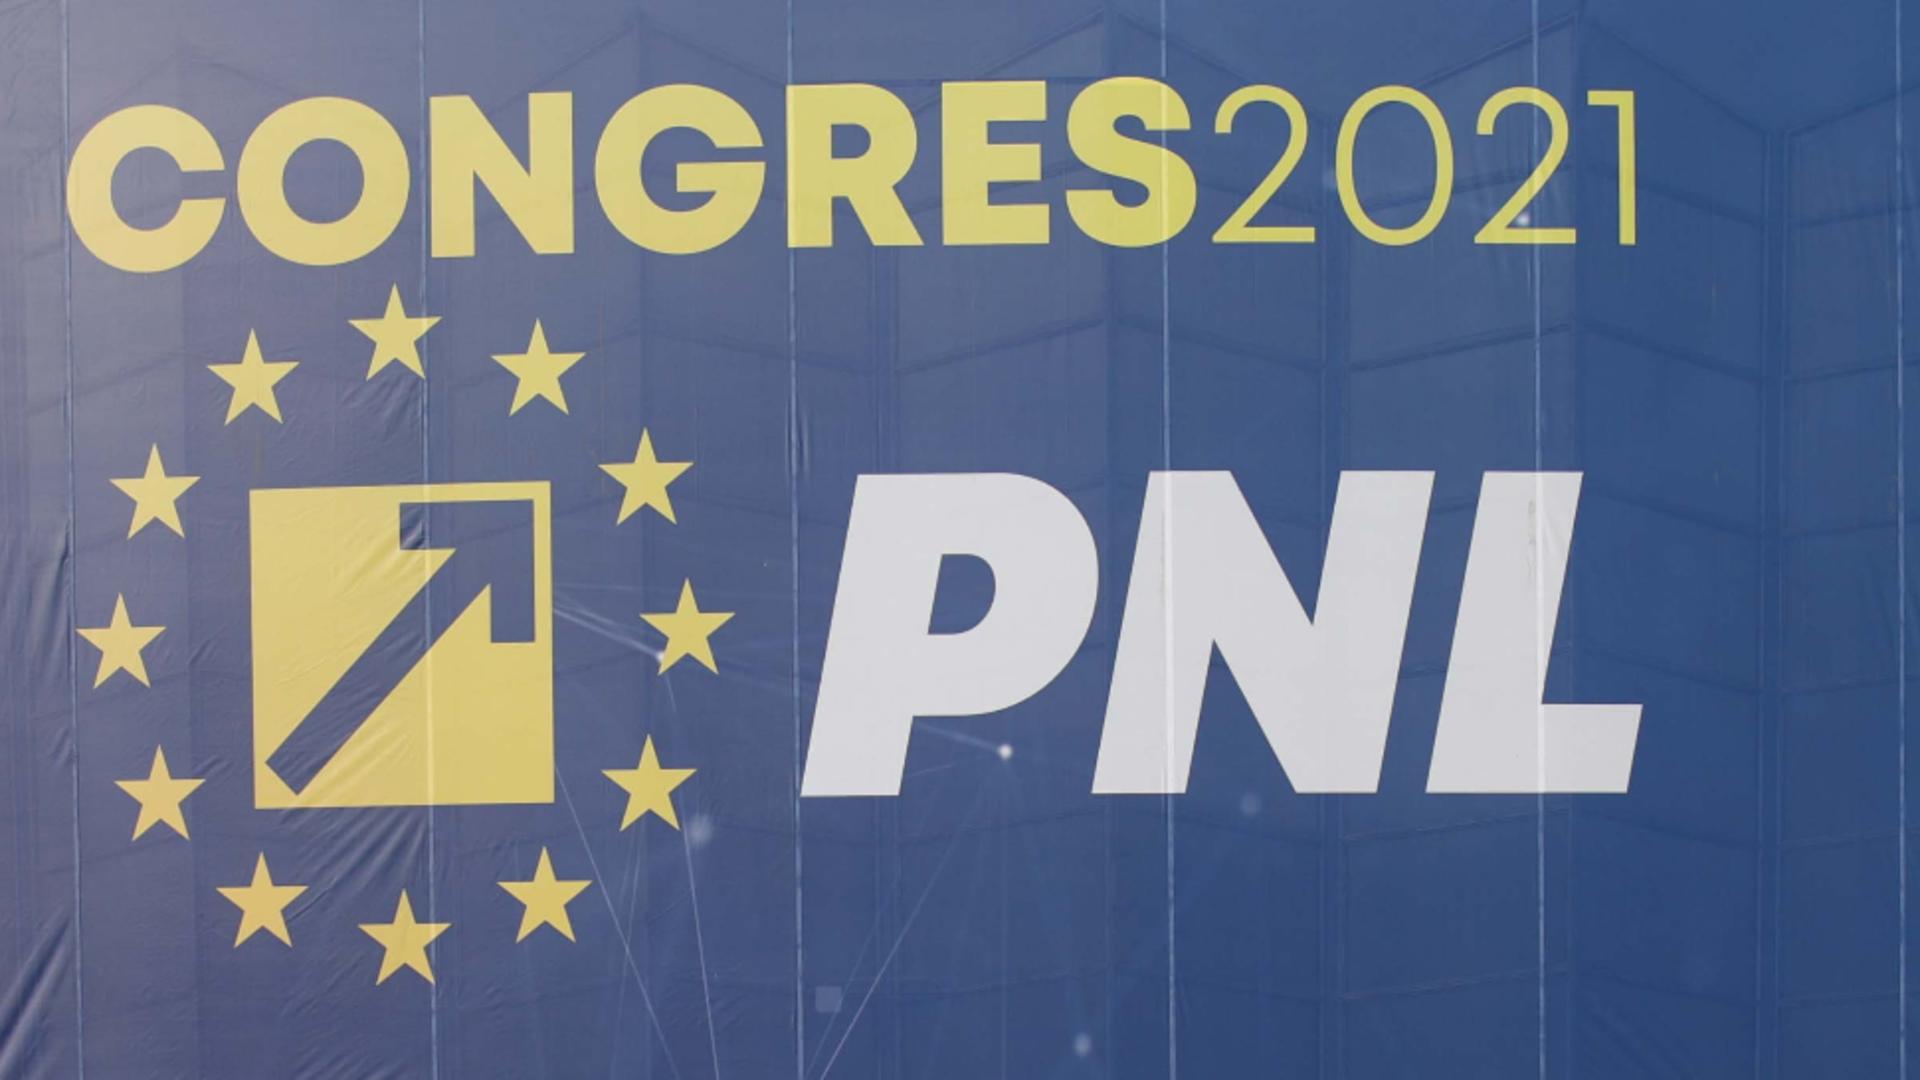 Congres PNL, 25 septembrie 2021 Foto: INQUAM/Octav Ganea